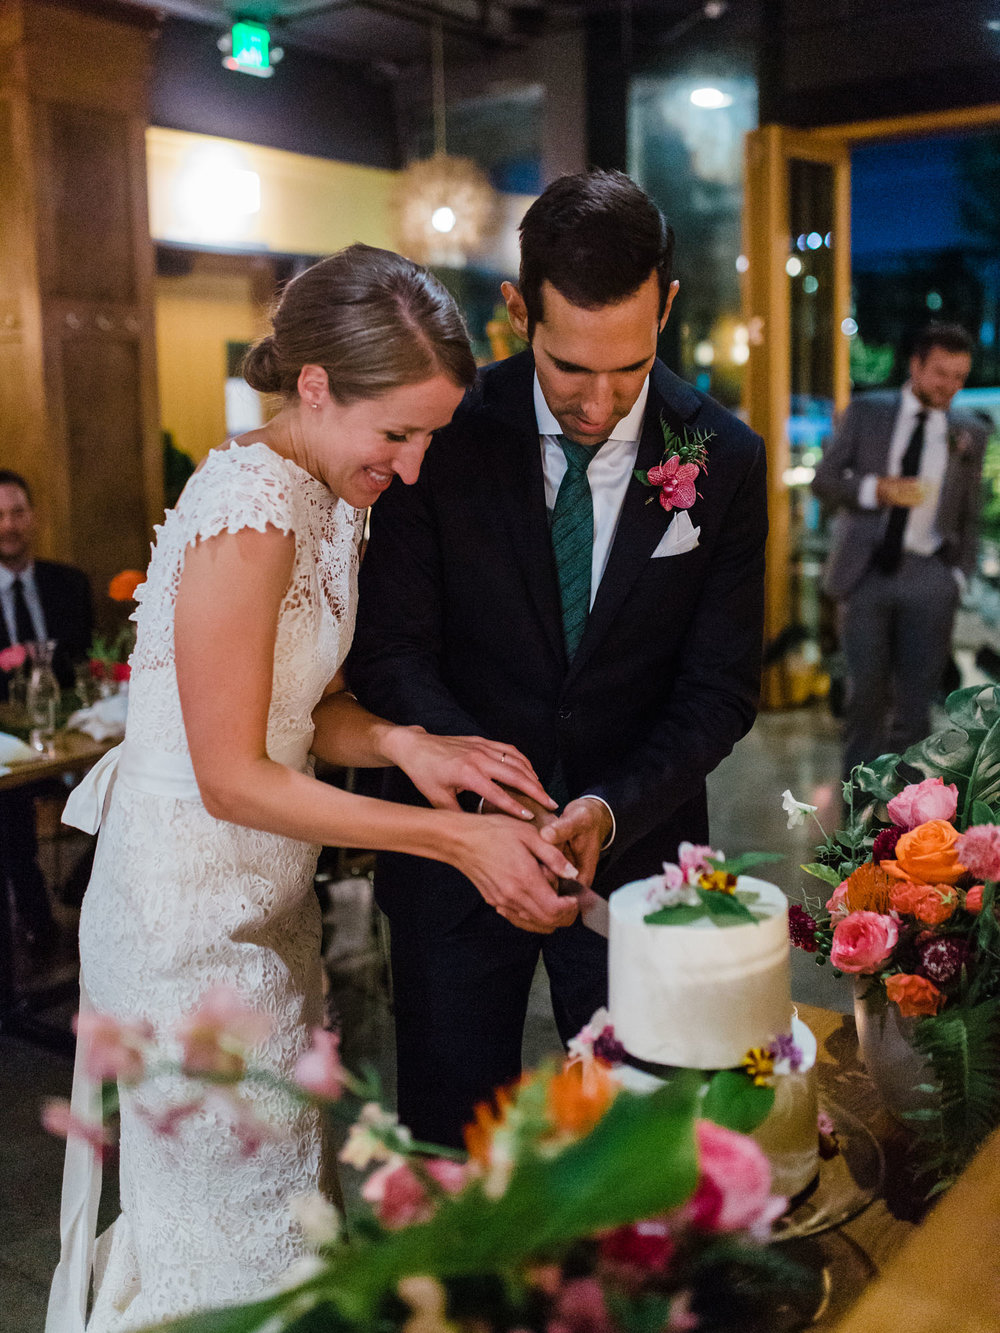 Seattle Capital Hill Intimate Wedding Reception Photography.jpg